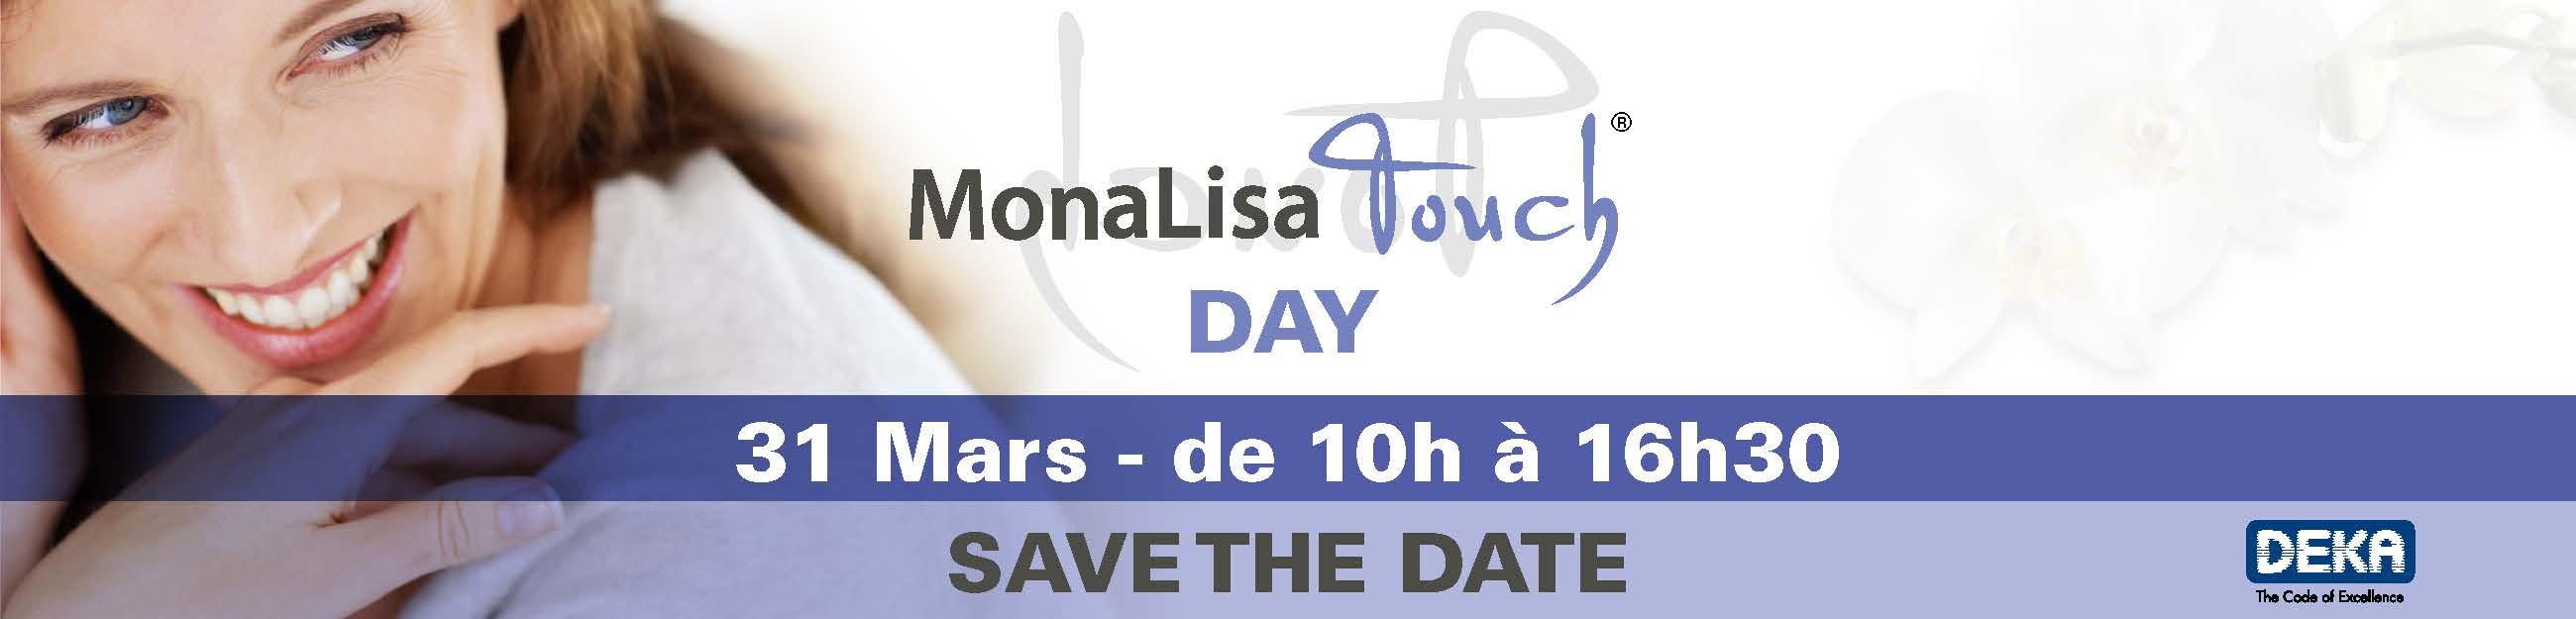 Monalisa-Touch-624x150-3